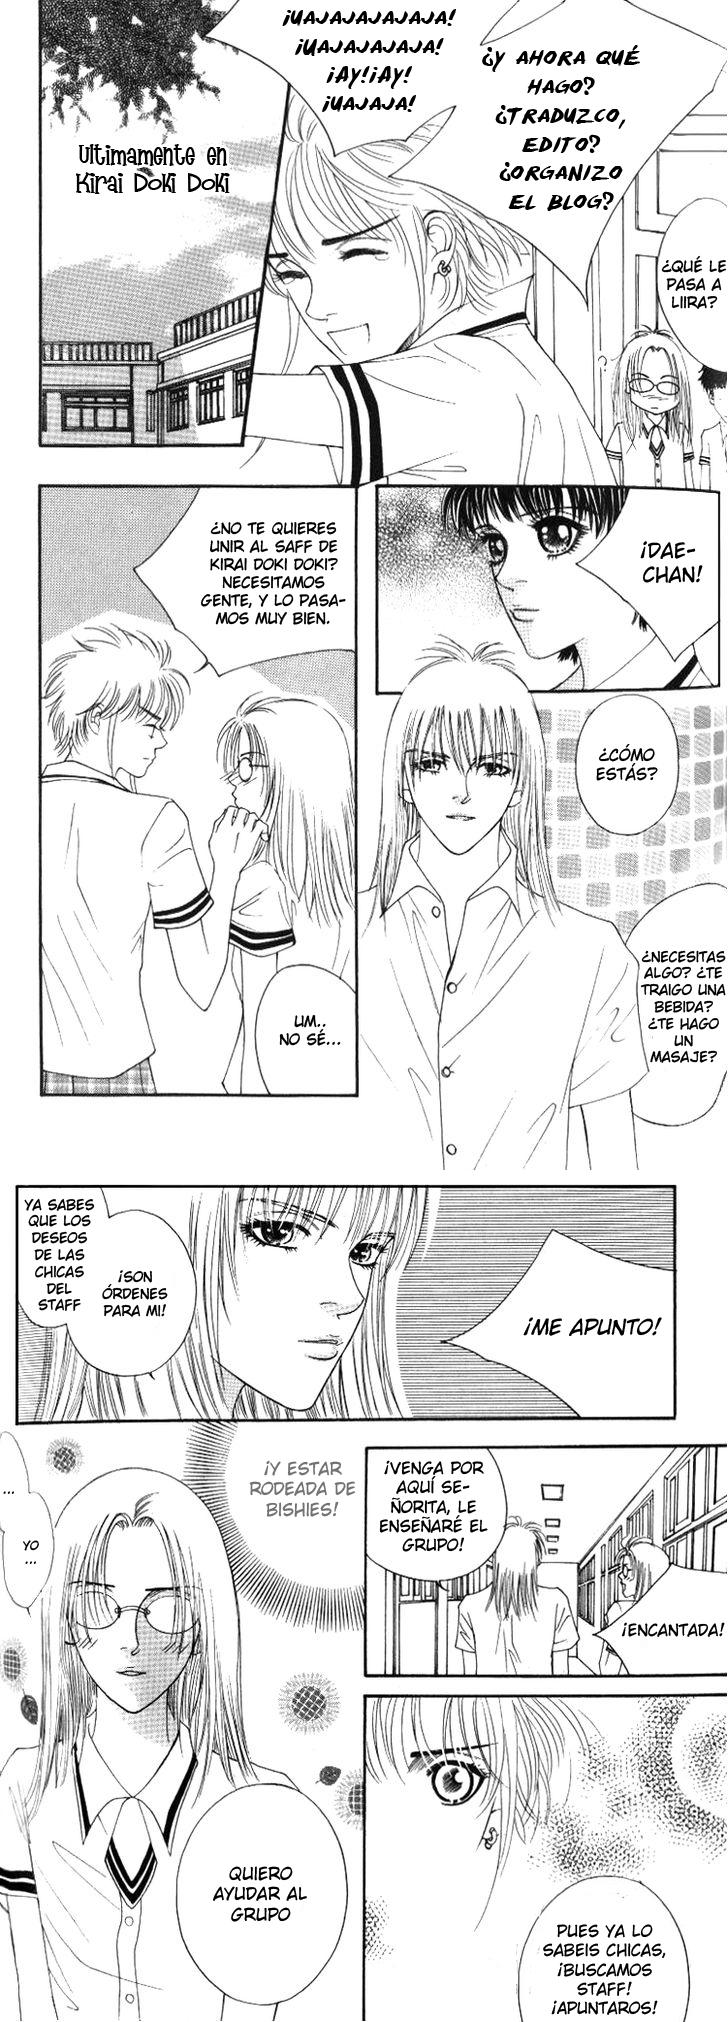 http://c5.ninemanga.com/es_manga/23/471/379082/448eef665e17d4284741fb76ac4e7eea.jpg Page 2